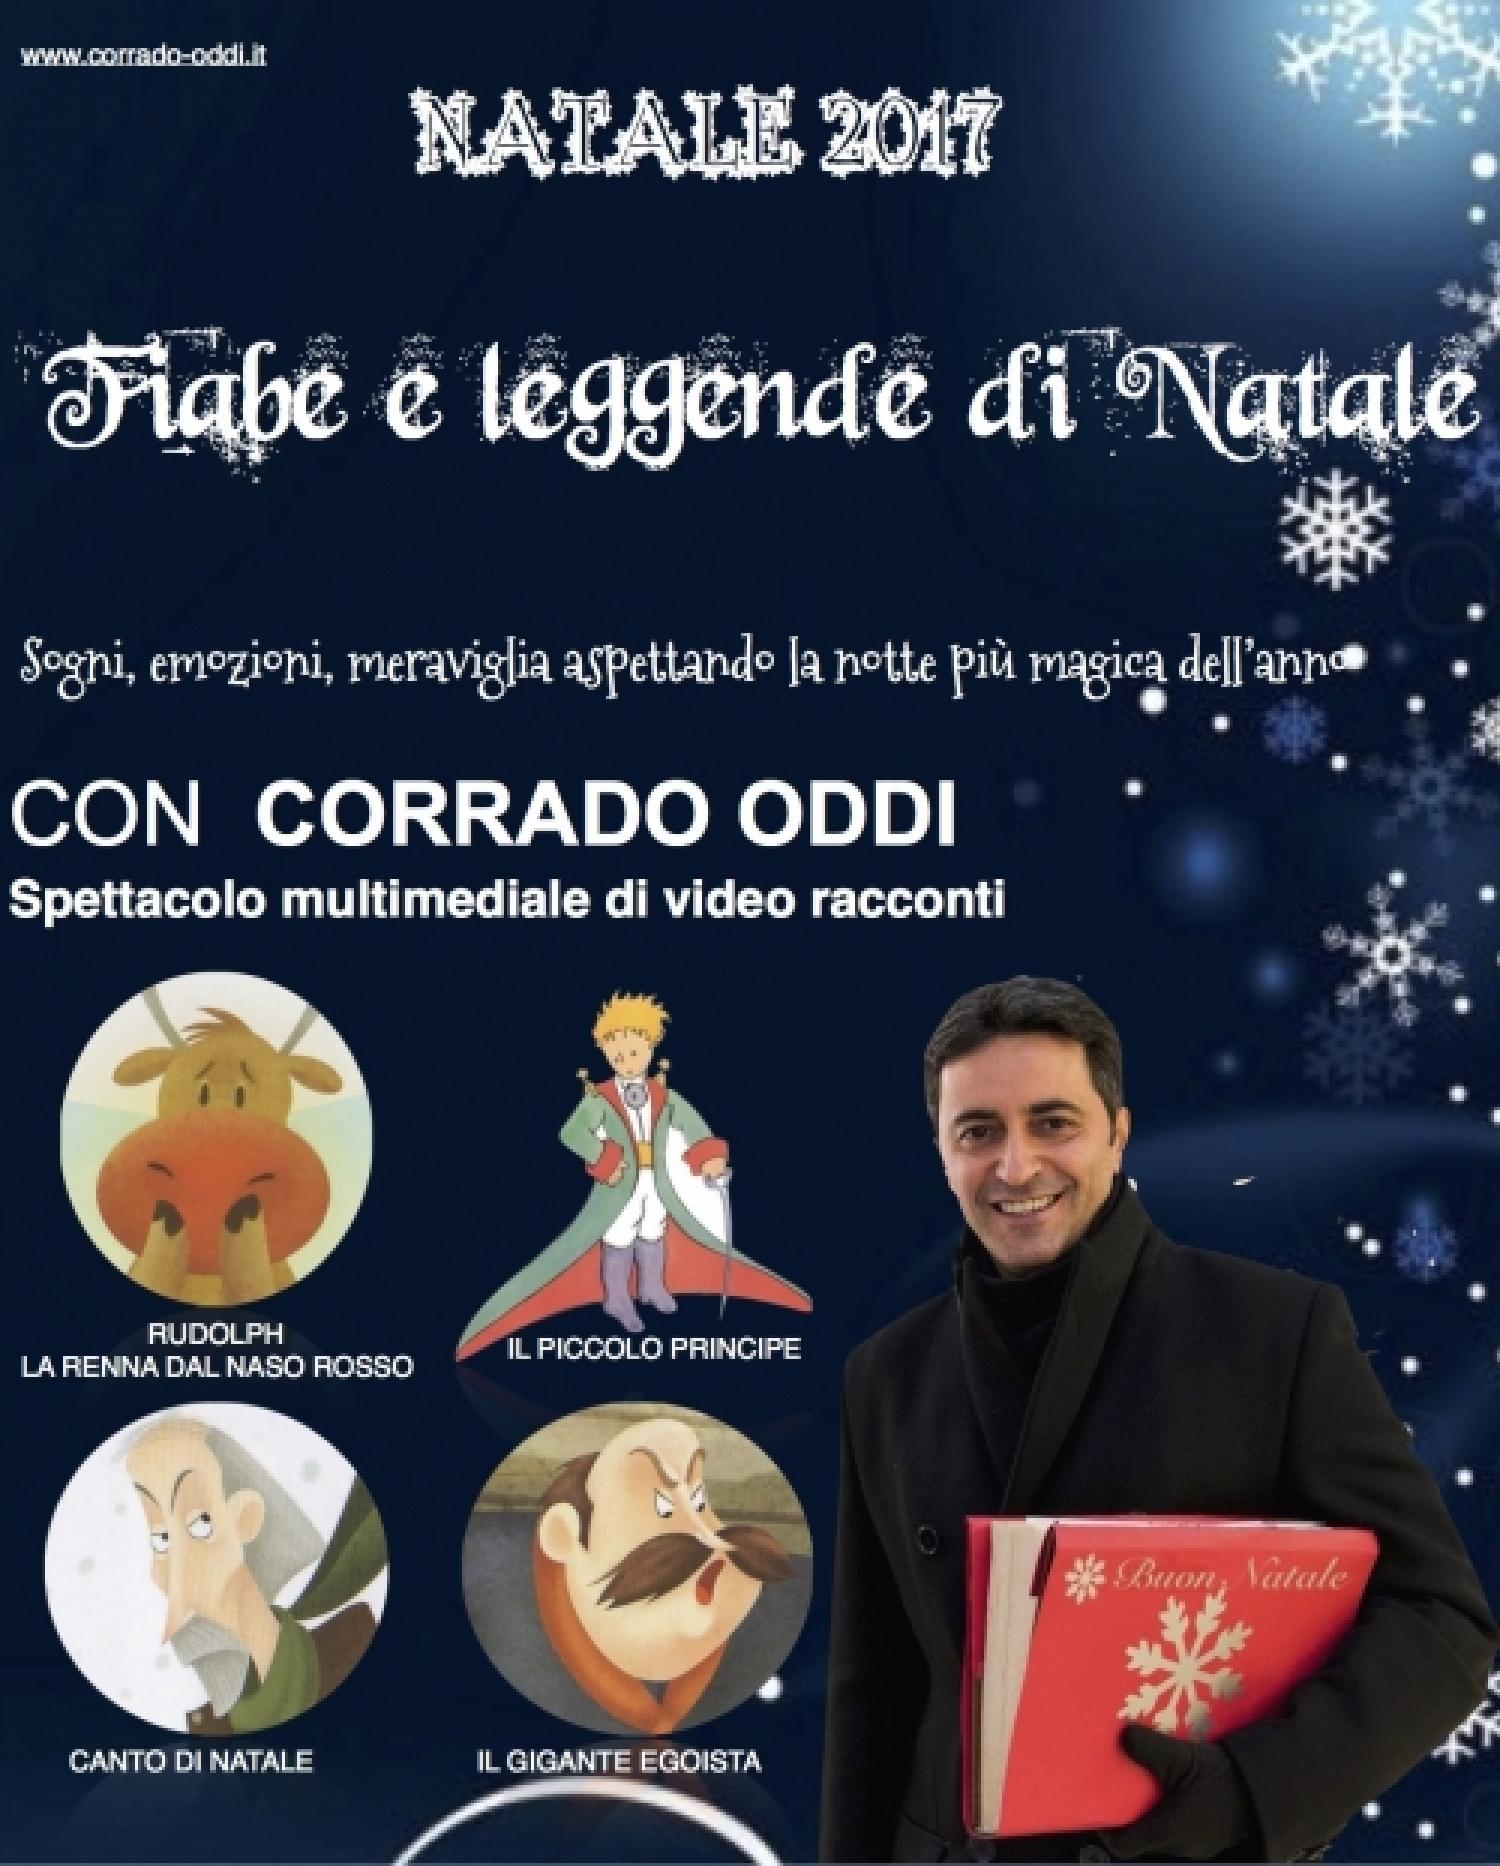 Locandina Stampa_Fiabe e leggende di Natale 2017.jpg